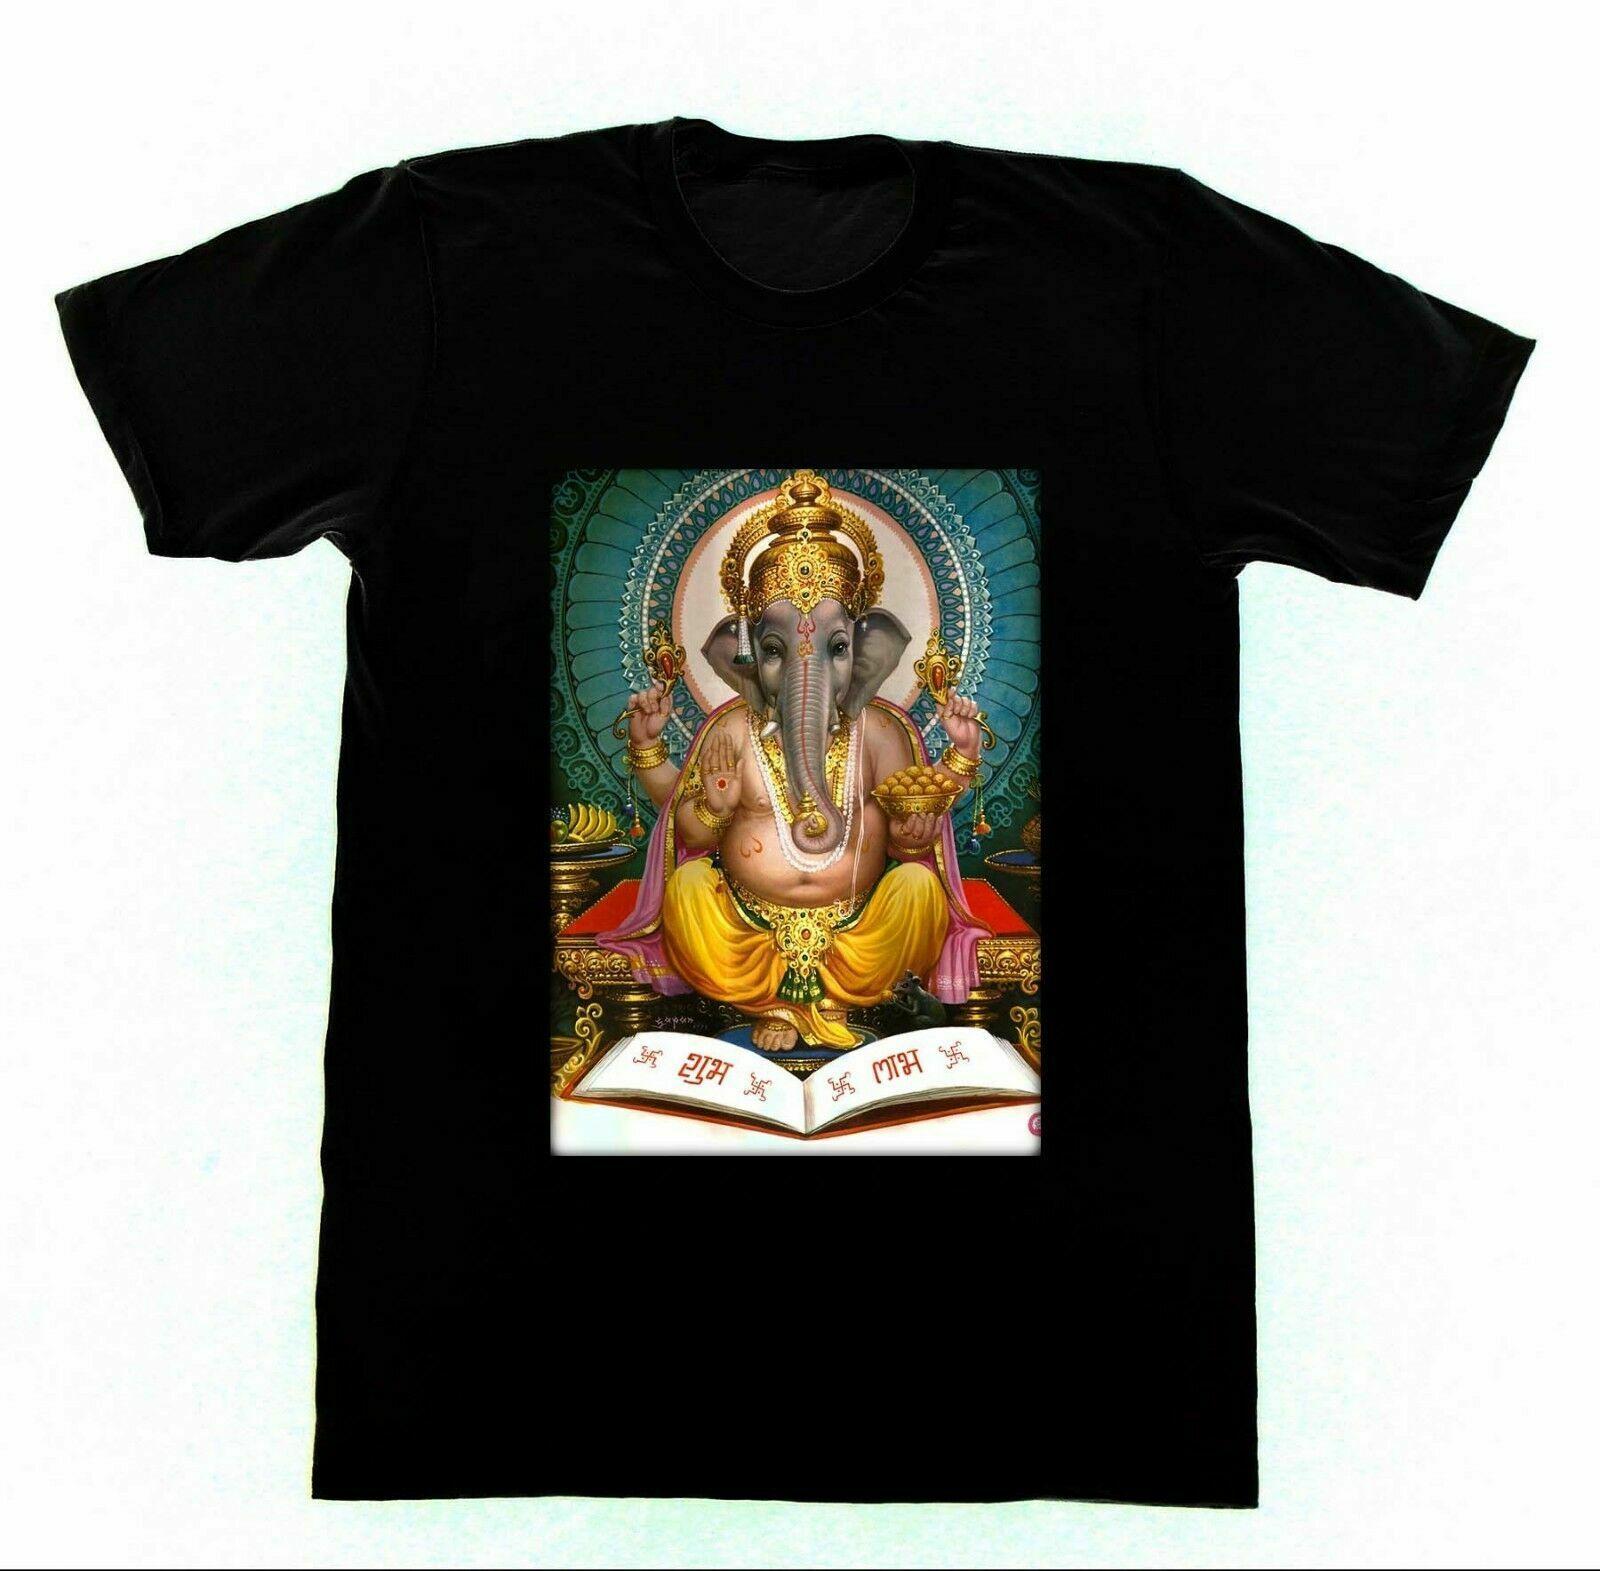 Camiseta Ganesh 50 Kali Shiva Krishna Yoga de hinduismo Go Vintage hombres camiseta de regalo